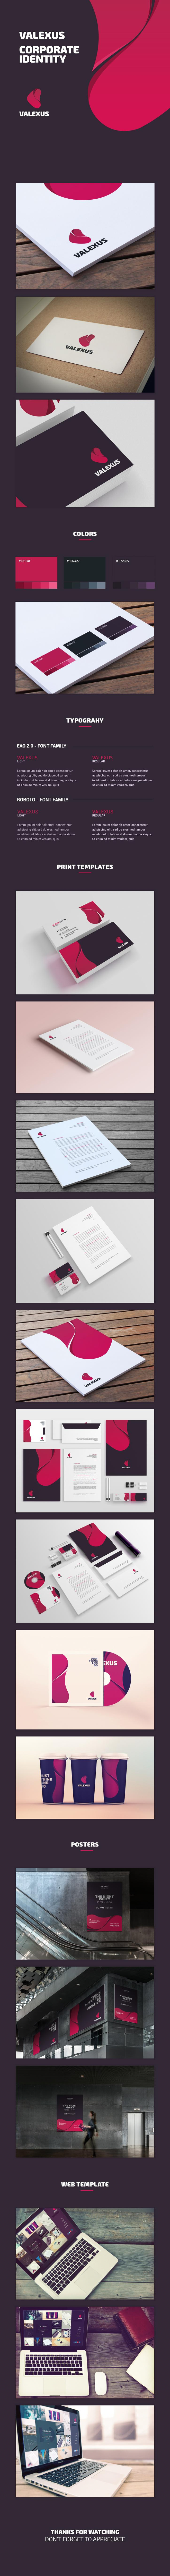 valexus identity corporate logo business card letterhead envelop poster Web violet red wave package